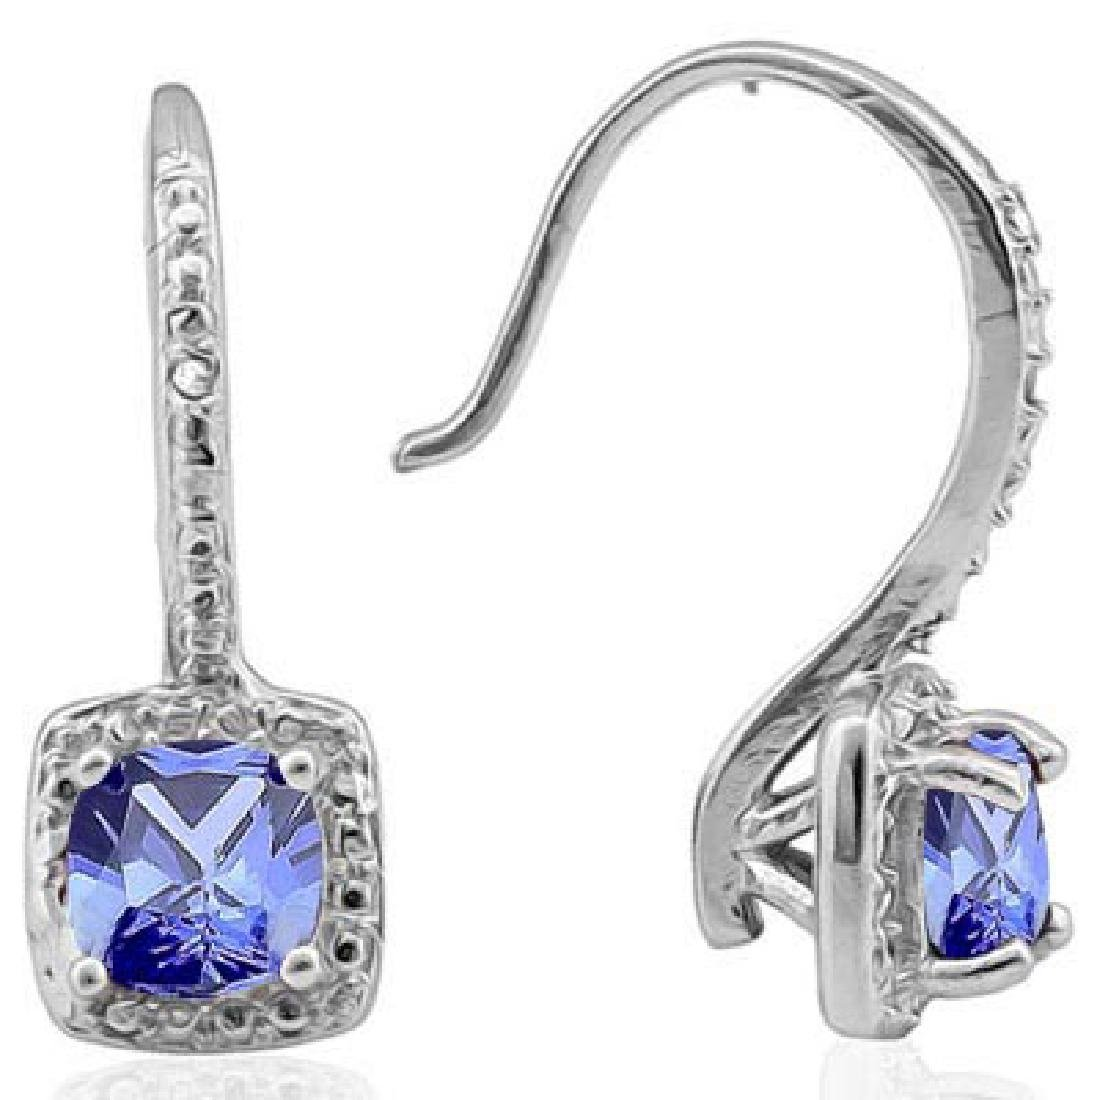 1 4/5 CARAT LAB TANZANITE & DIAMOND 925 STERLING SILVER